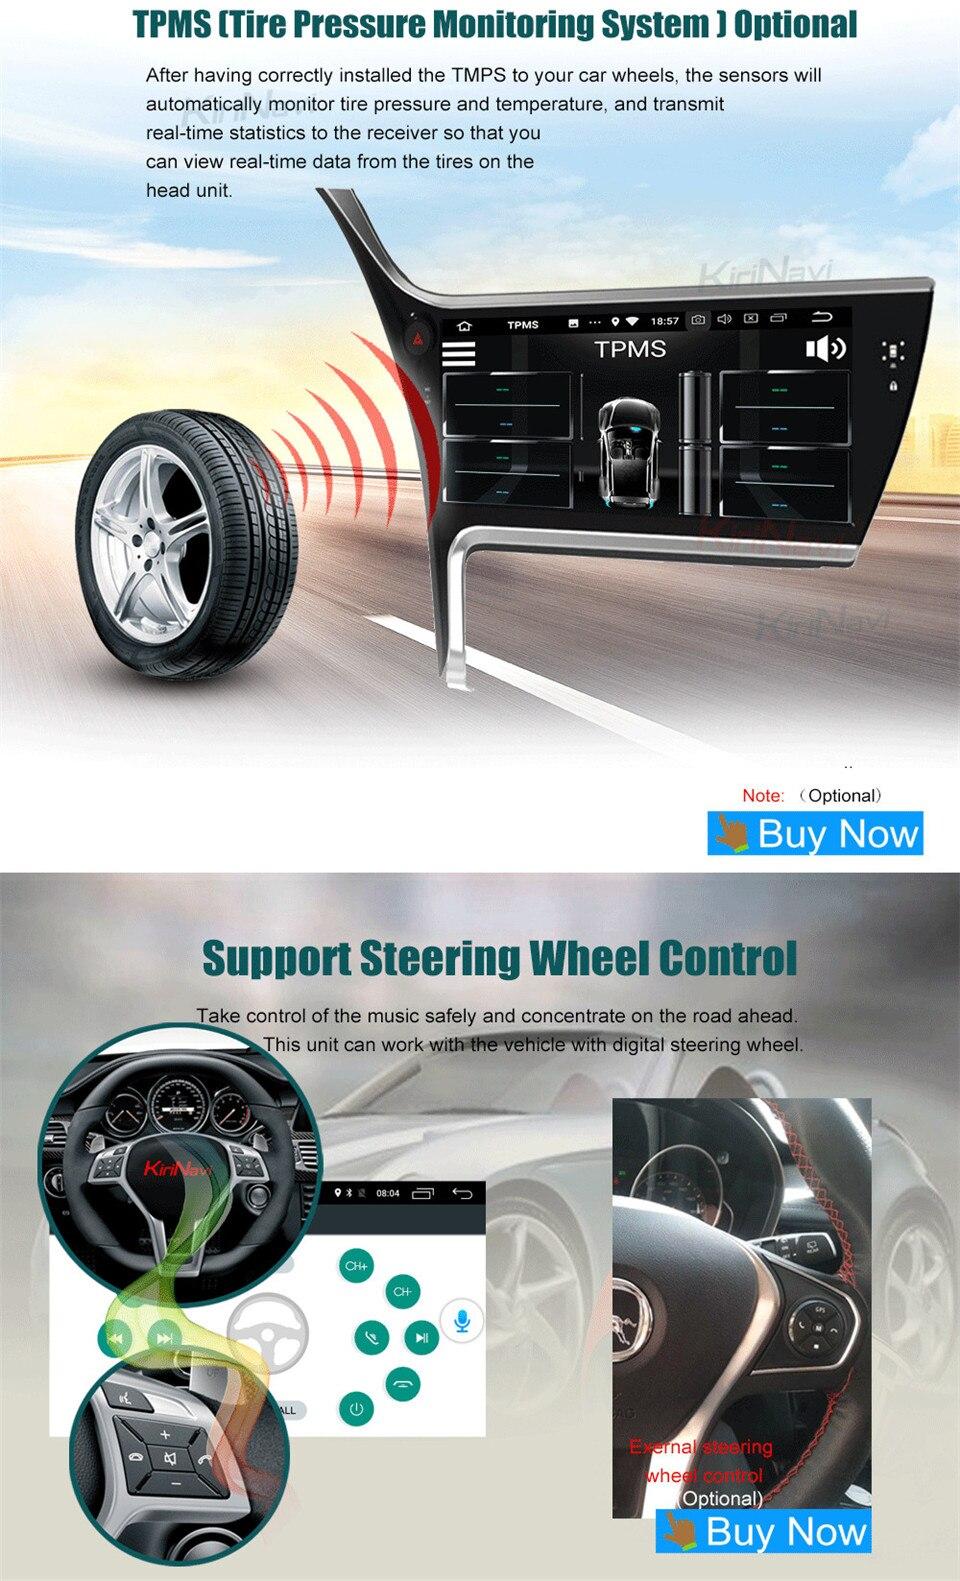 KiriNavi Car Radio For Toyota Corolla 17 (12)